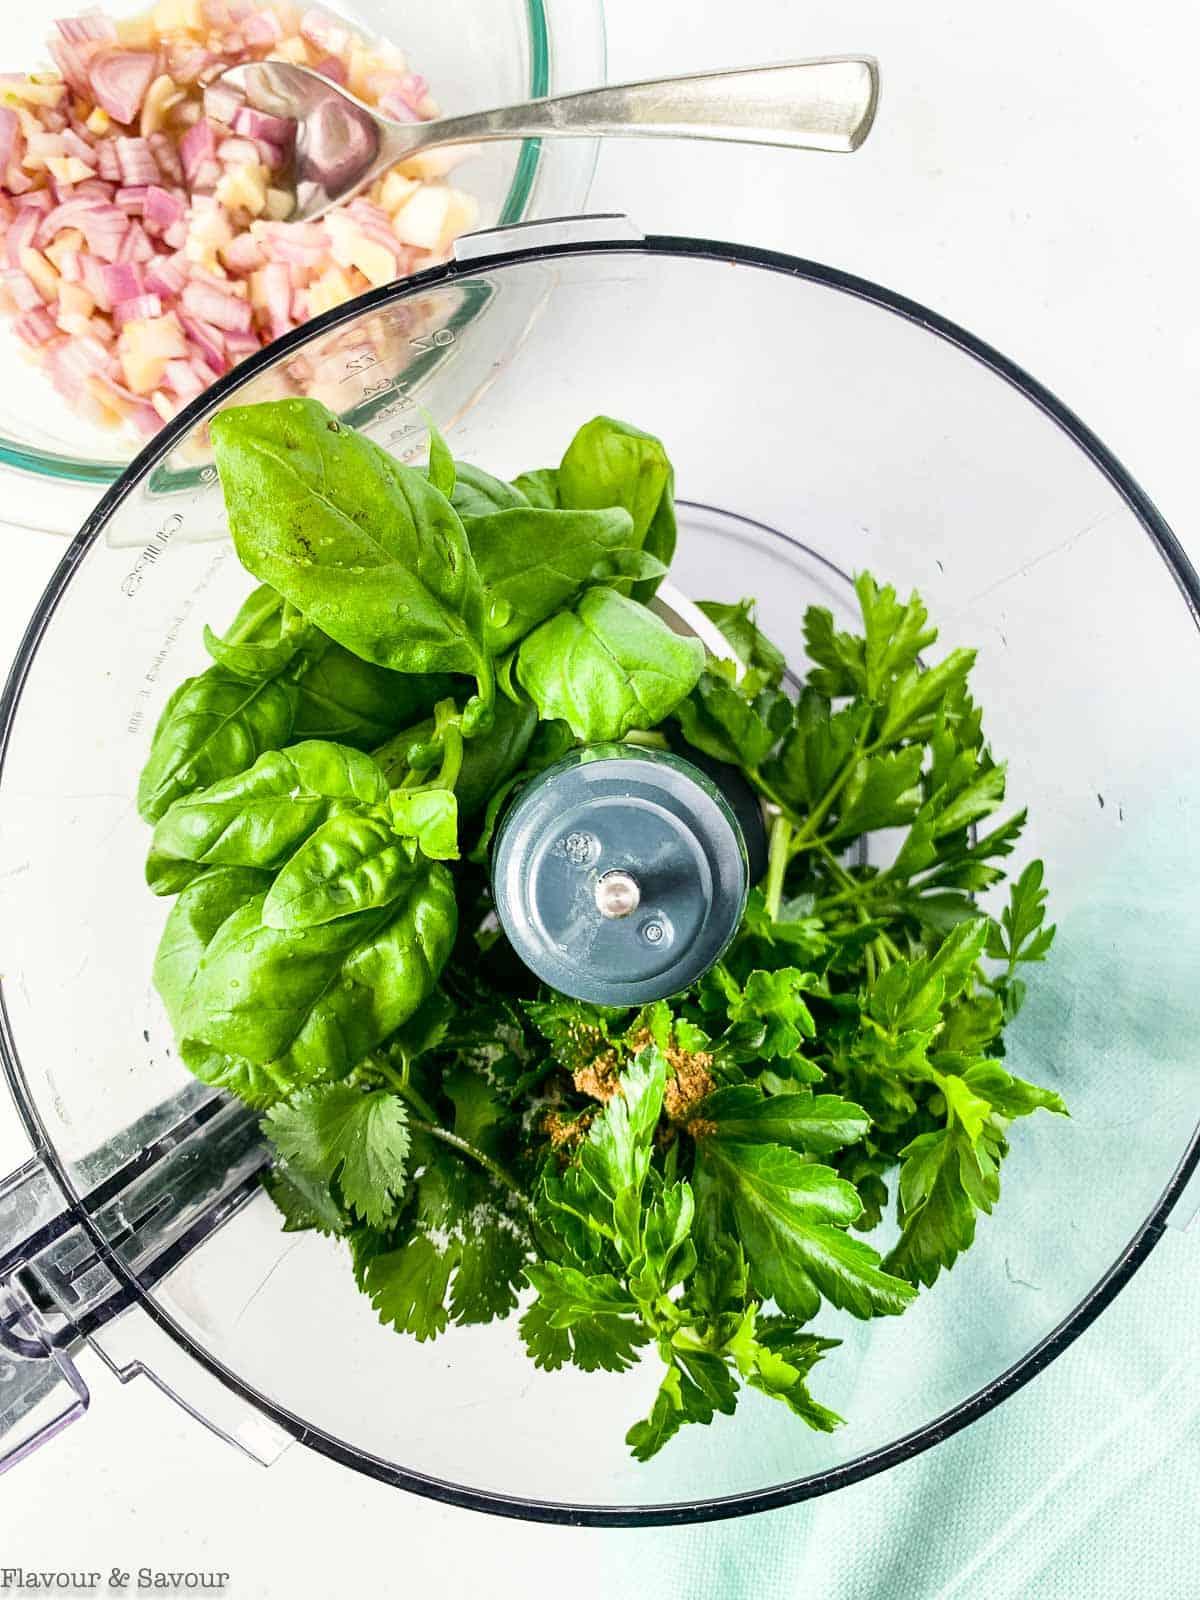 add herbs to food processor to make chimichurri sauce for salmon